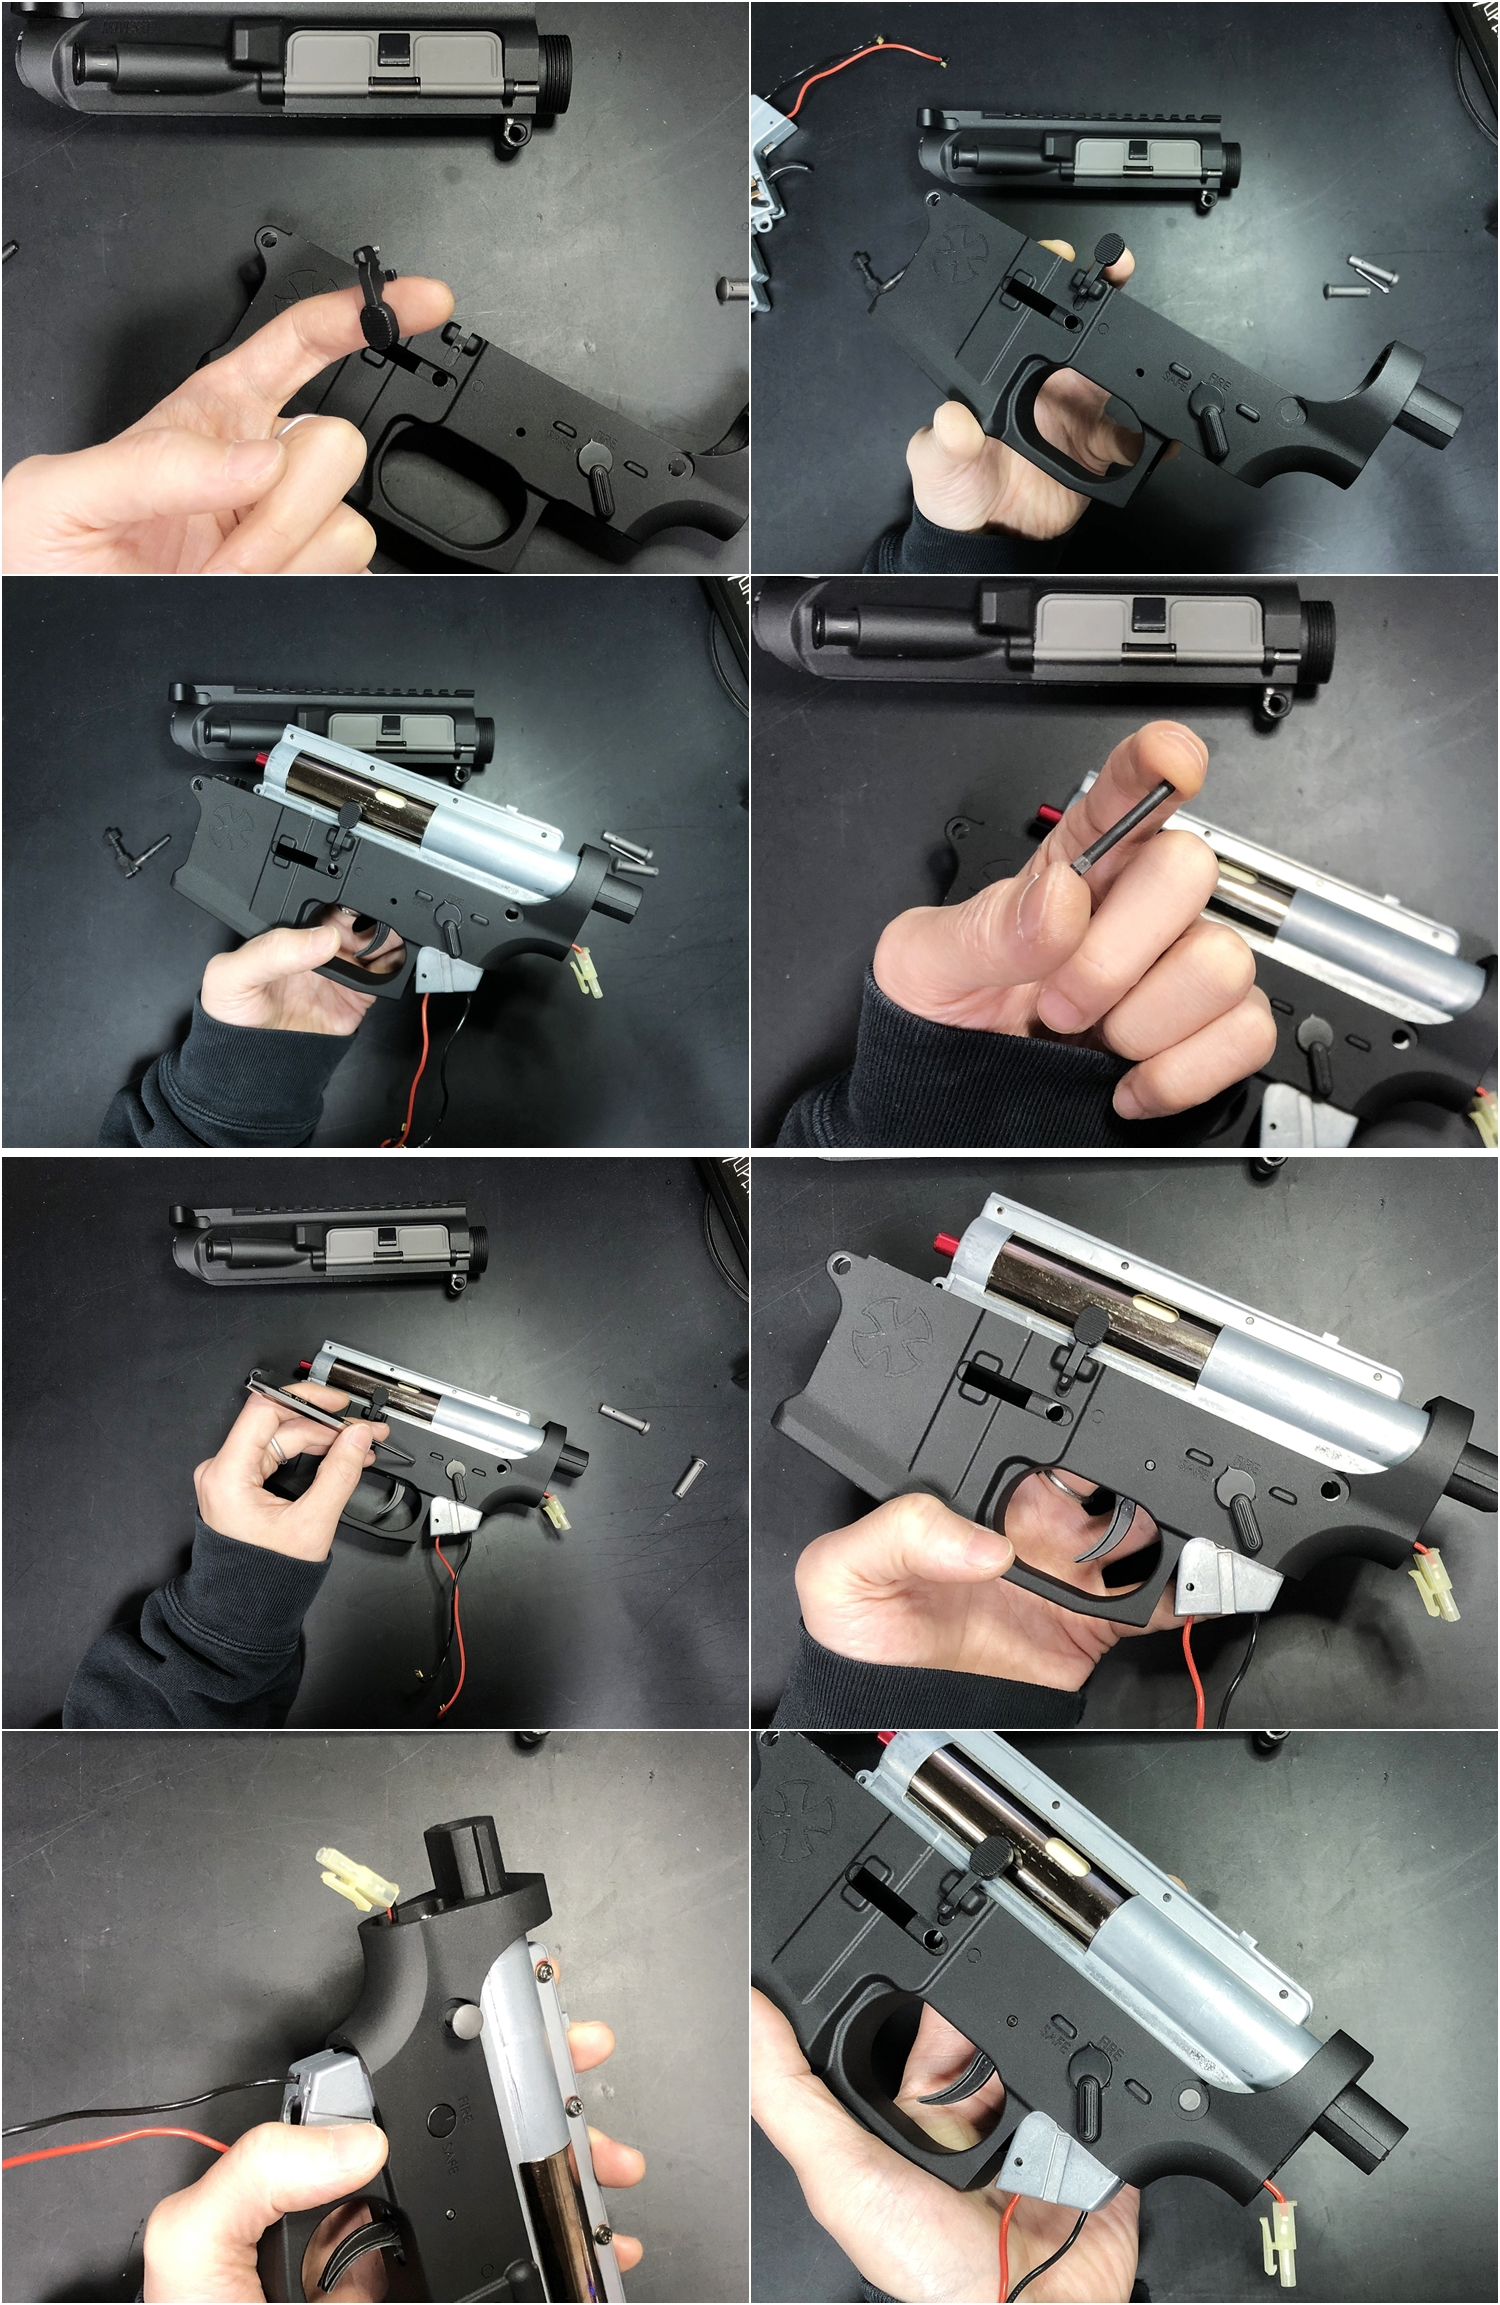 13 NOVESKE GEN3 N4 BY MADBULL!! 『第一弾』 新たにSTD民間系ARを作り始めたいと思います!! STD AR-15 M4 スタンダード 電動ガン マルイ ノベスケ ノベスキー マットブル メタルフレーム 動作テスト 組込 取付 カス